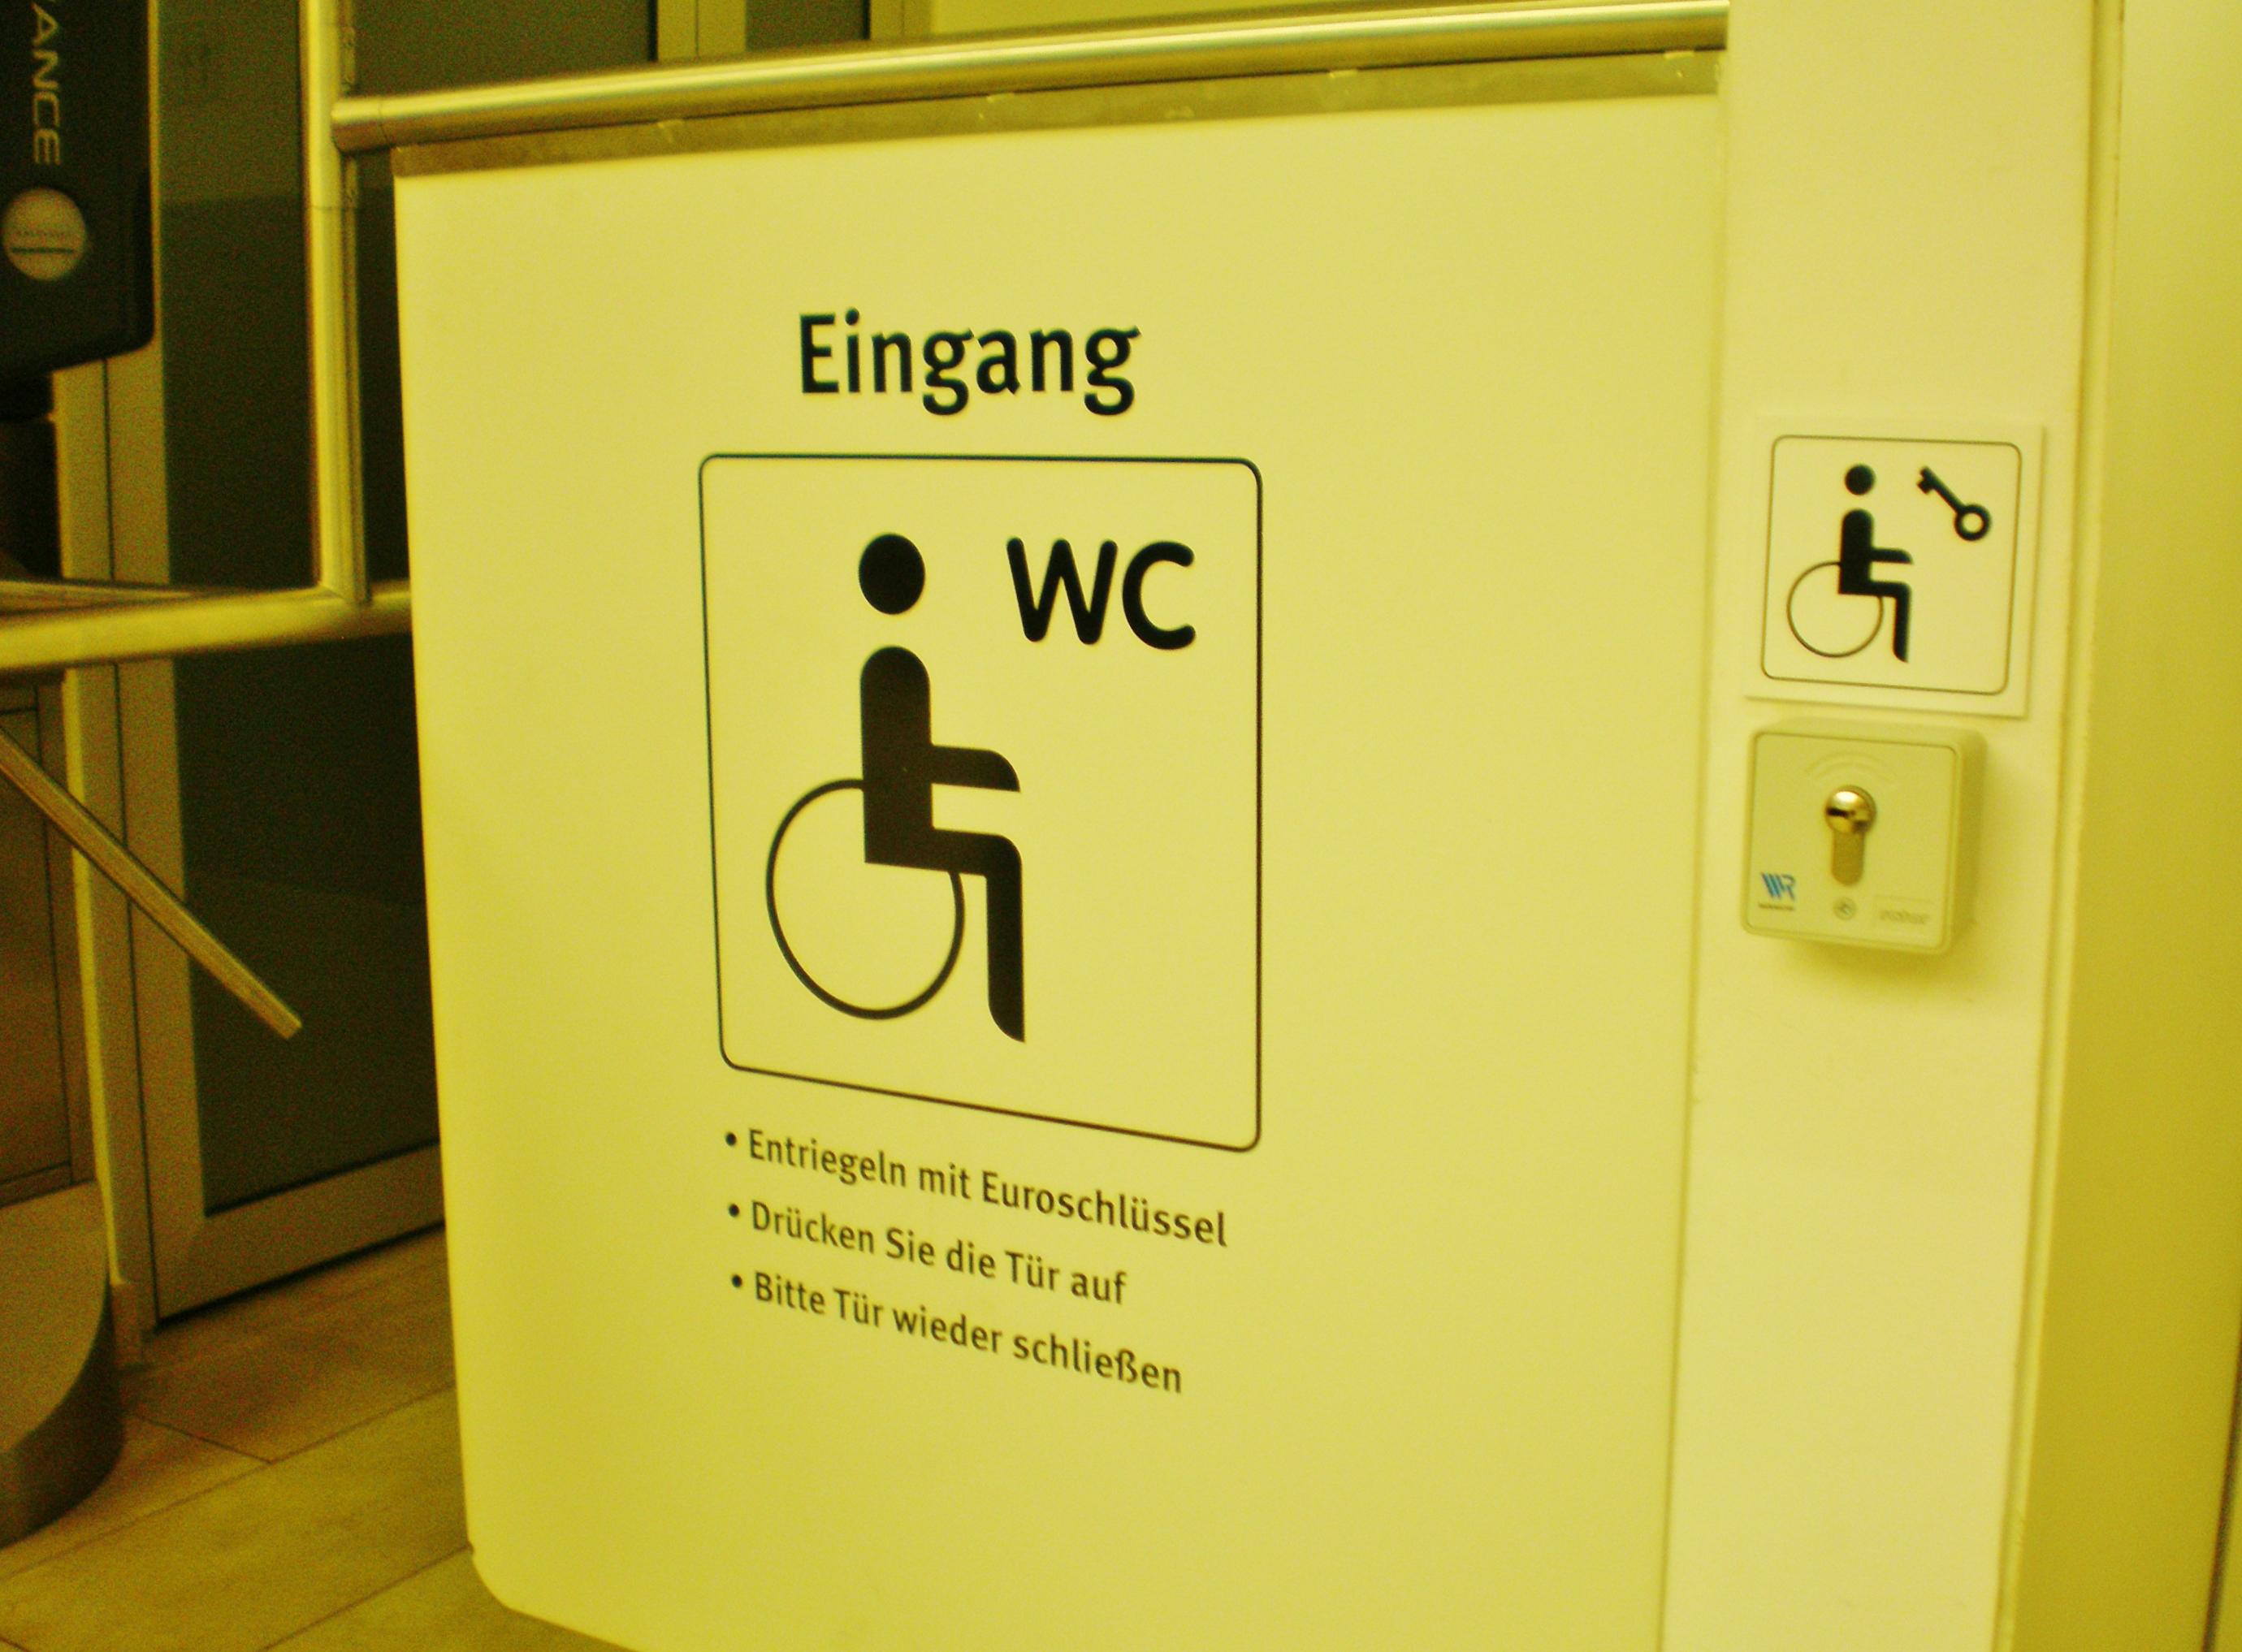 aktive f rderung behinderter menschen e v rollstuhlgerechte toiletten gestestet in bremerhaven. Black Bedroom Furniture Sets. Home Design Ideas